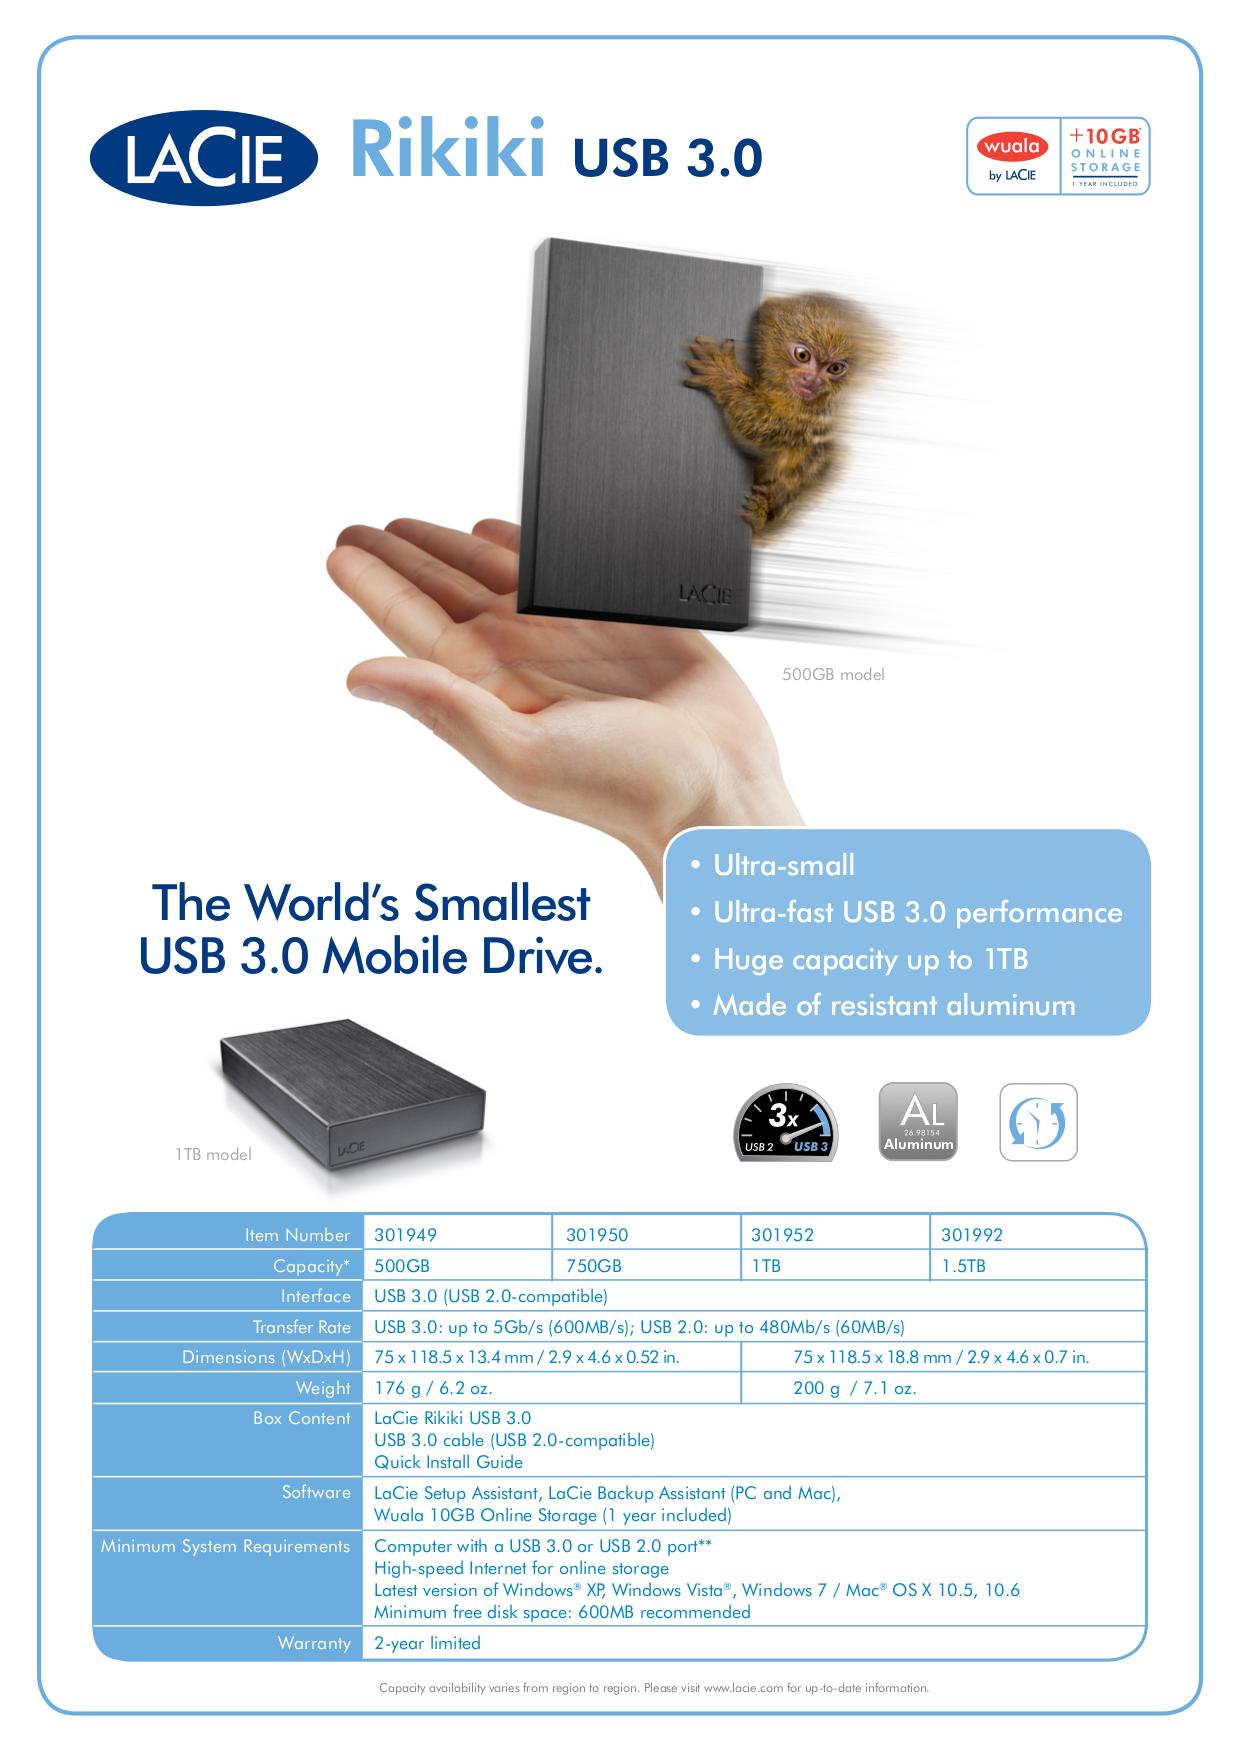 pdf for LaCie Storage 301952 manual